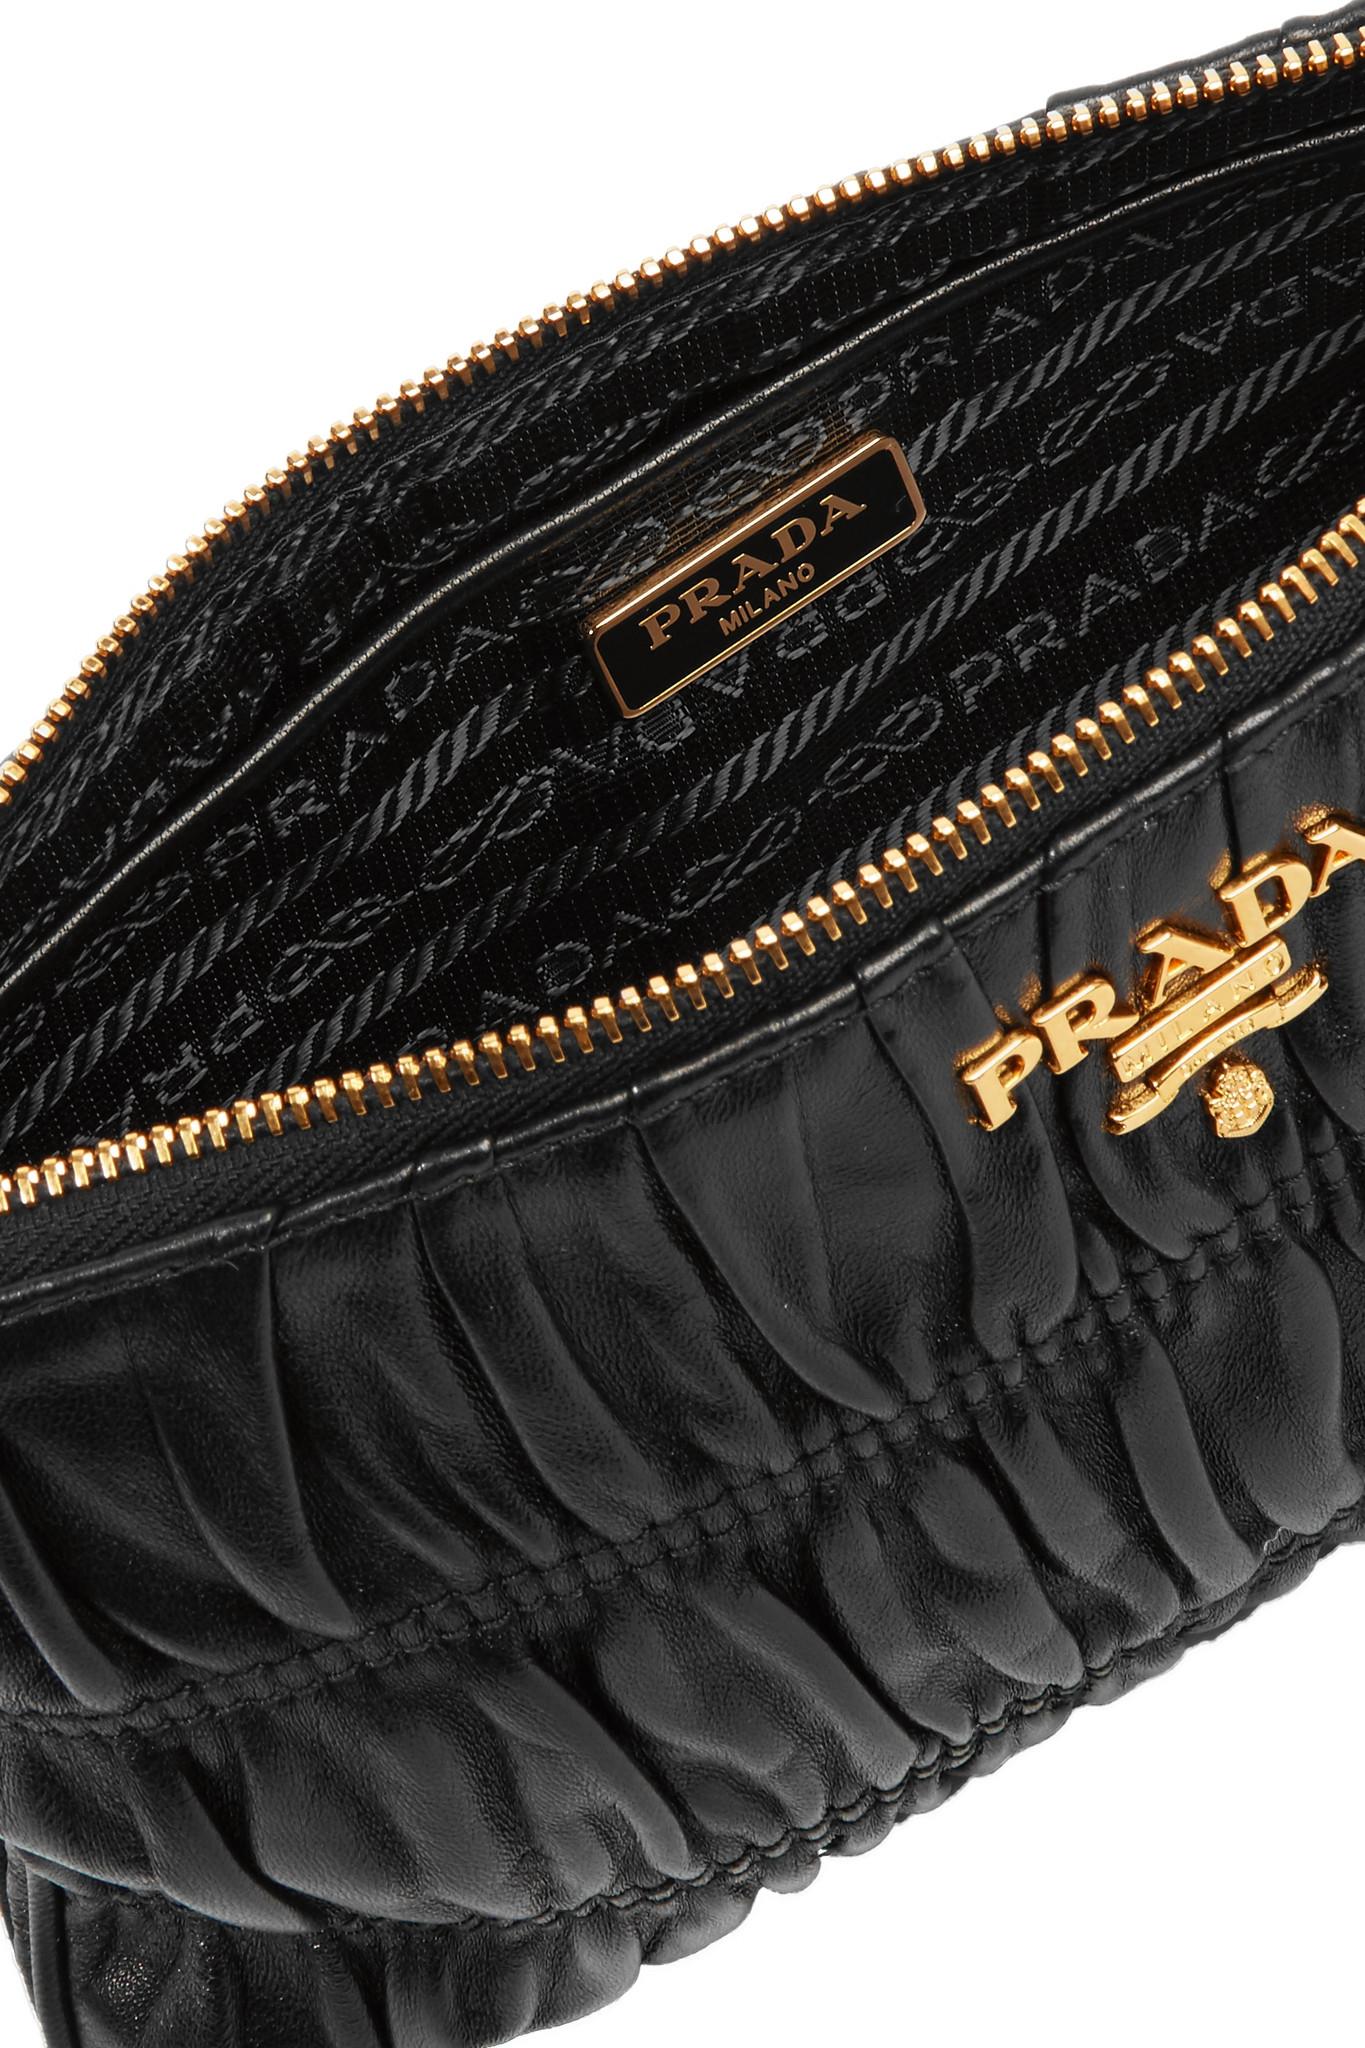 6b9ab765cb724c Prada Matelassé Leather Clutch in Black - Lyst